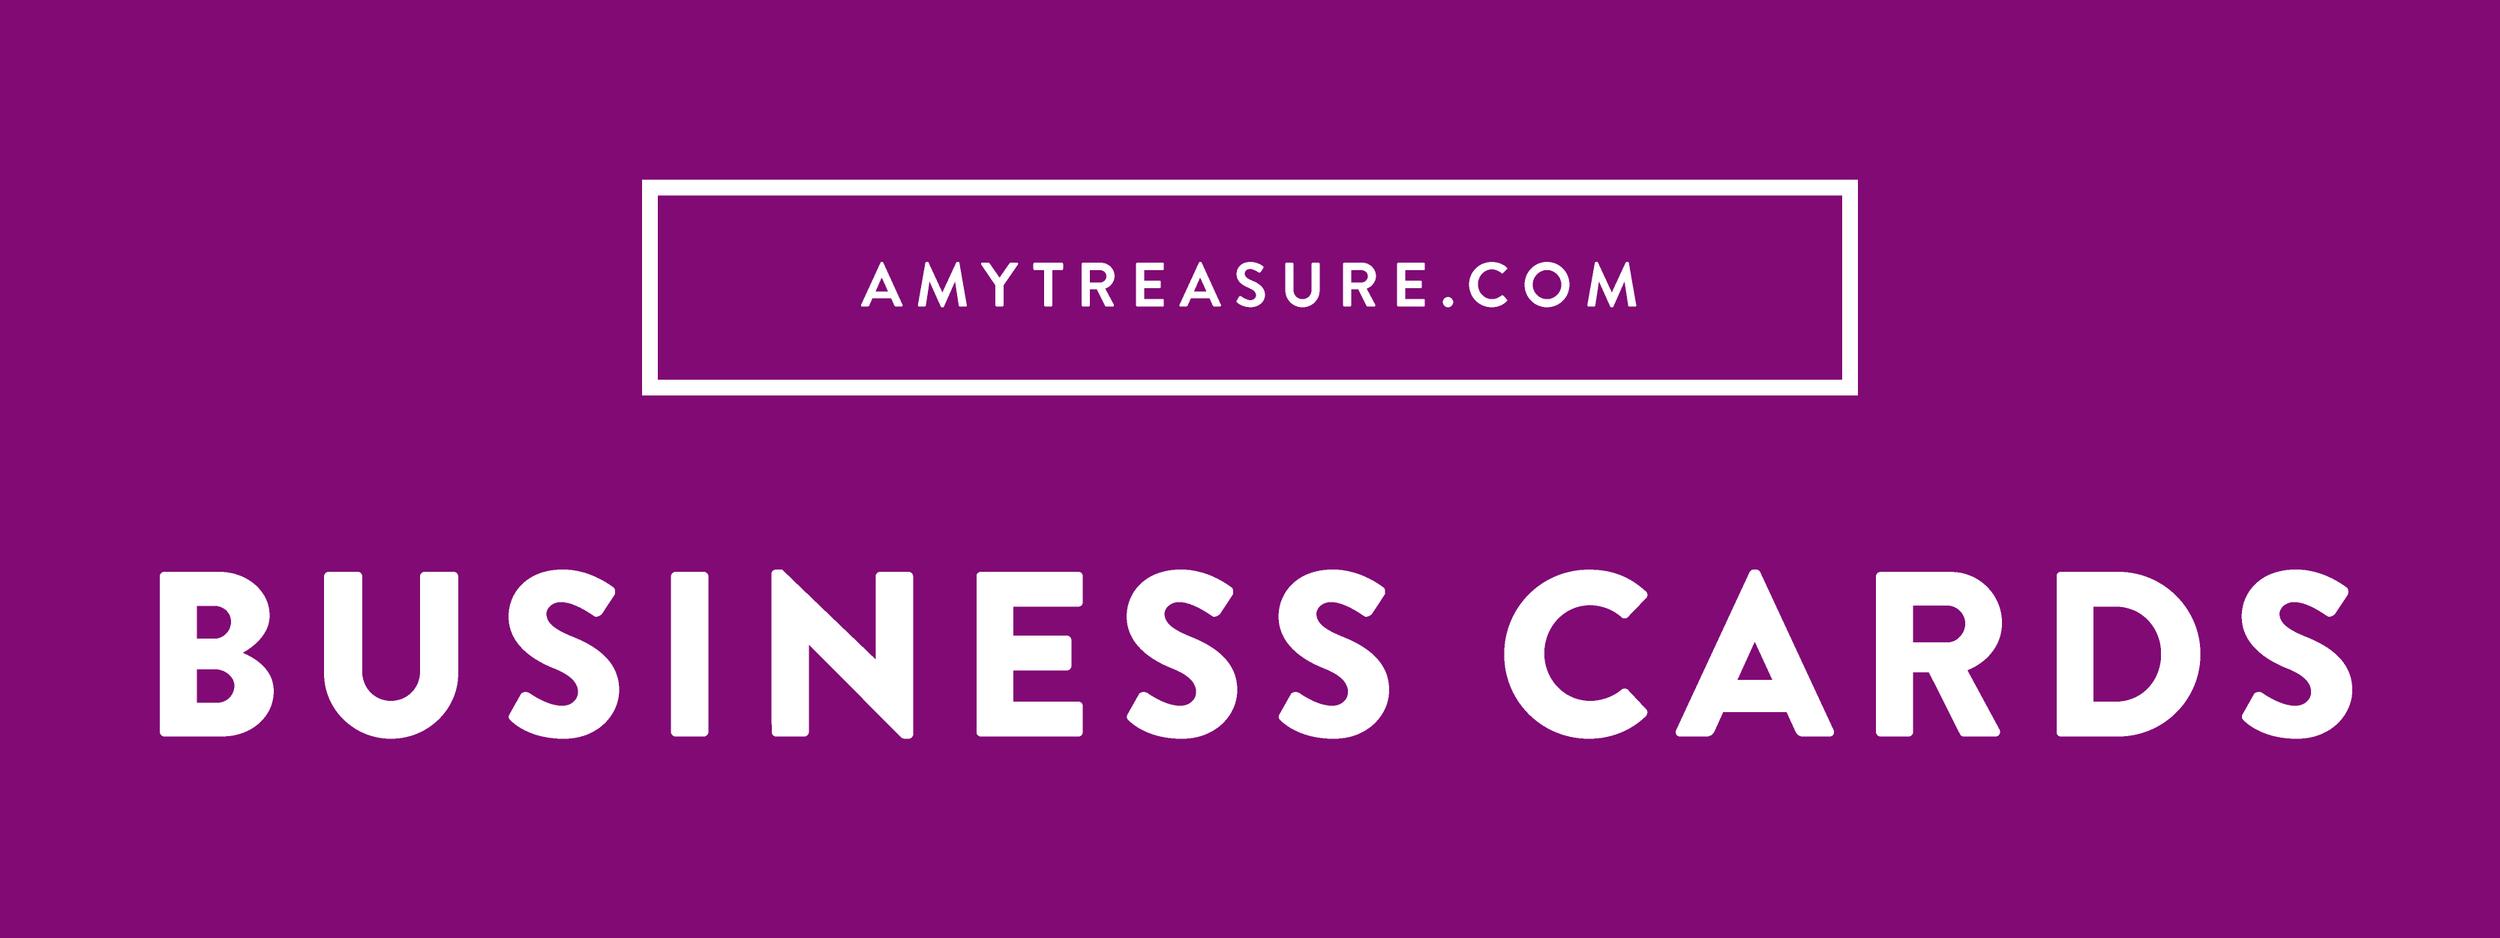 Business Cards header.png